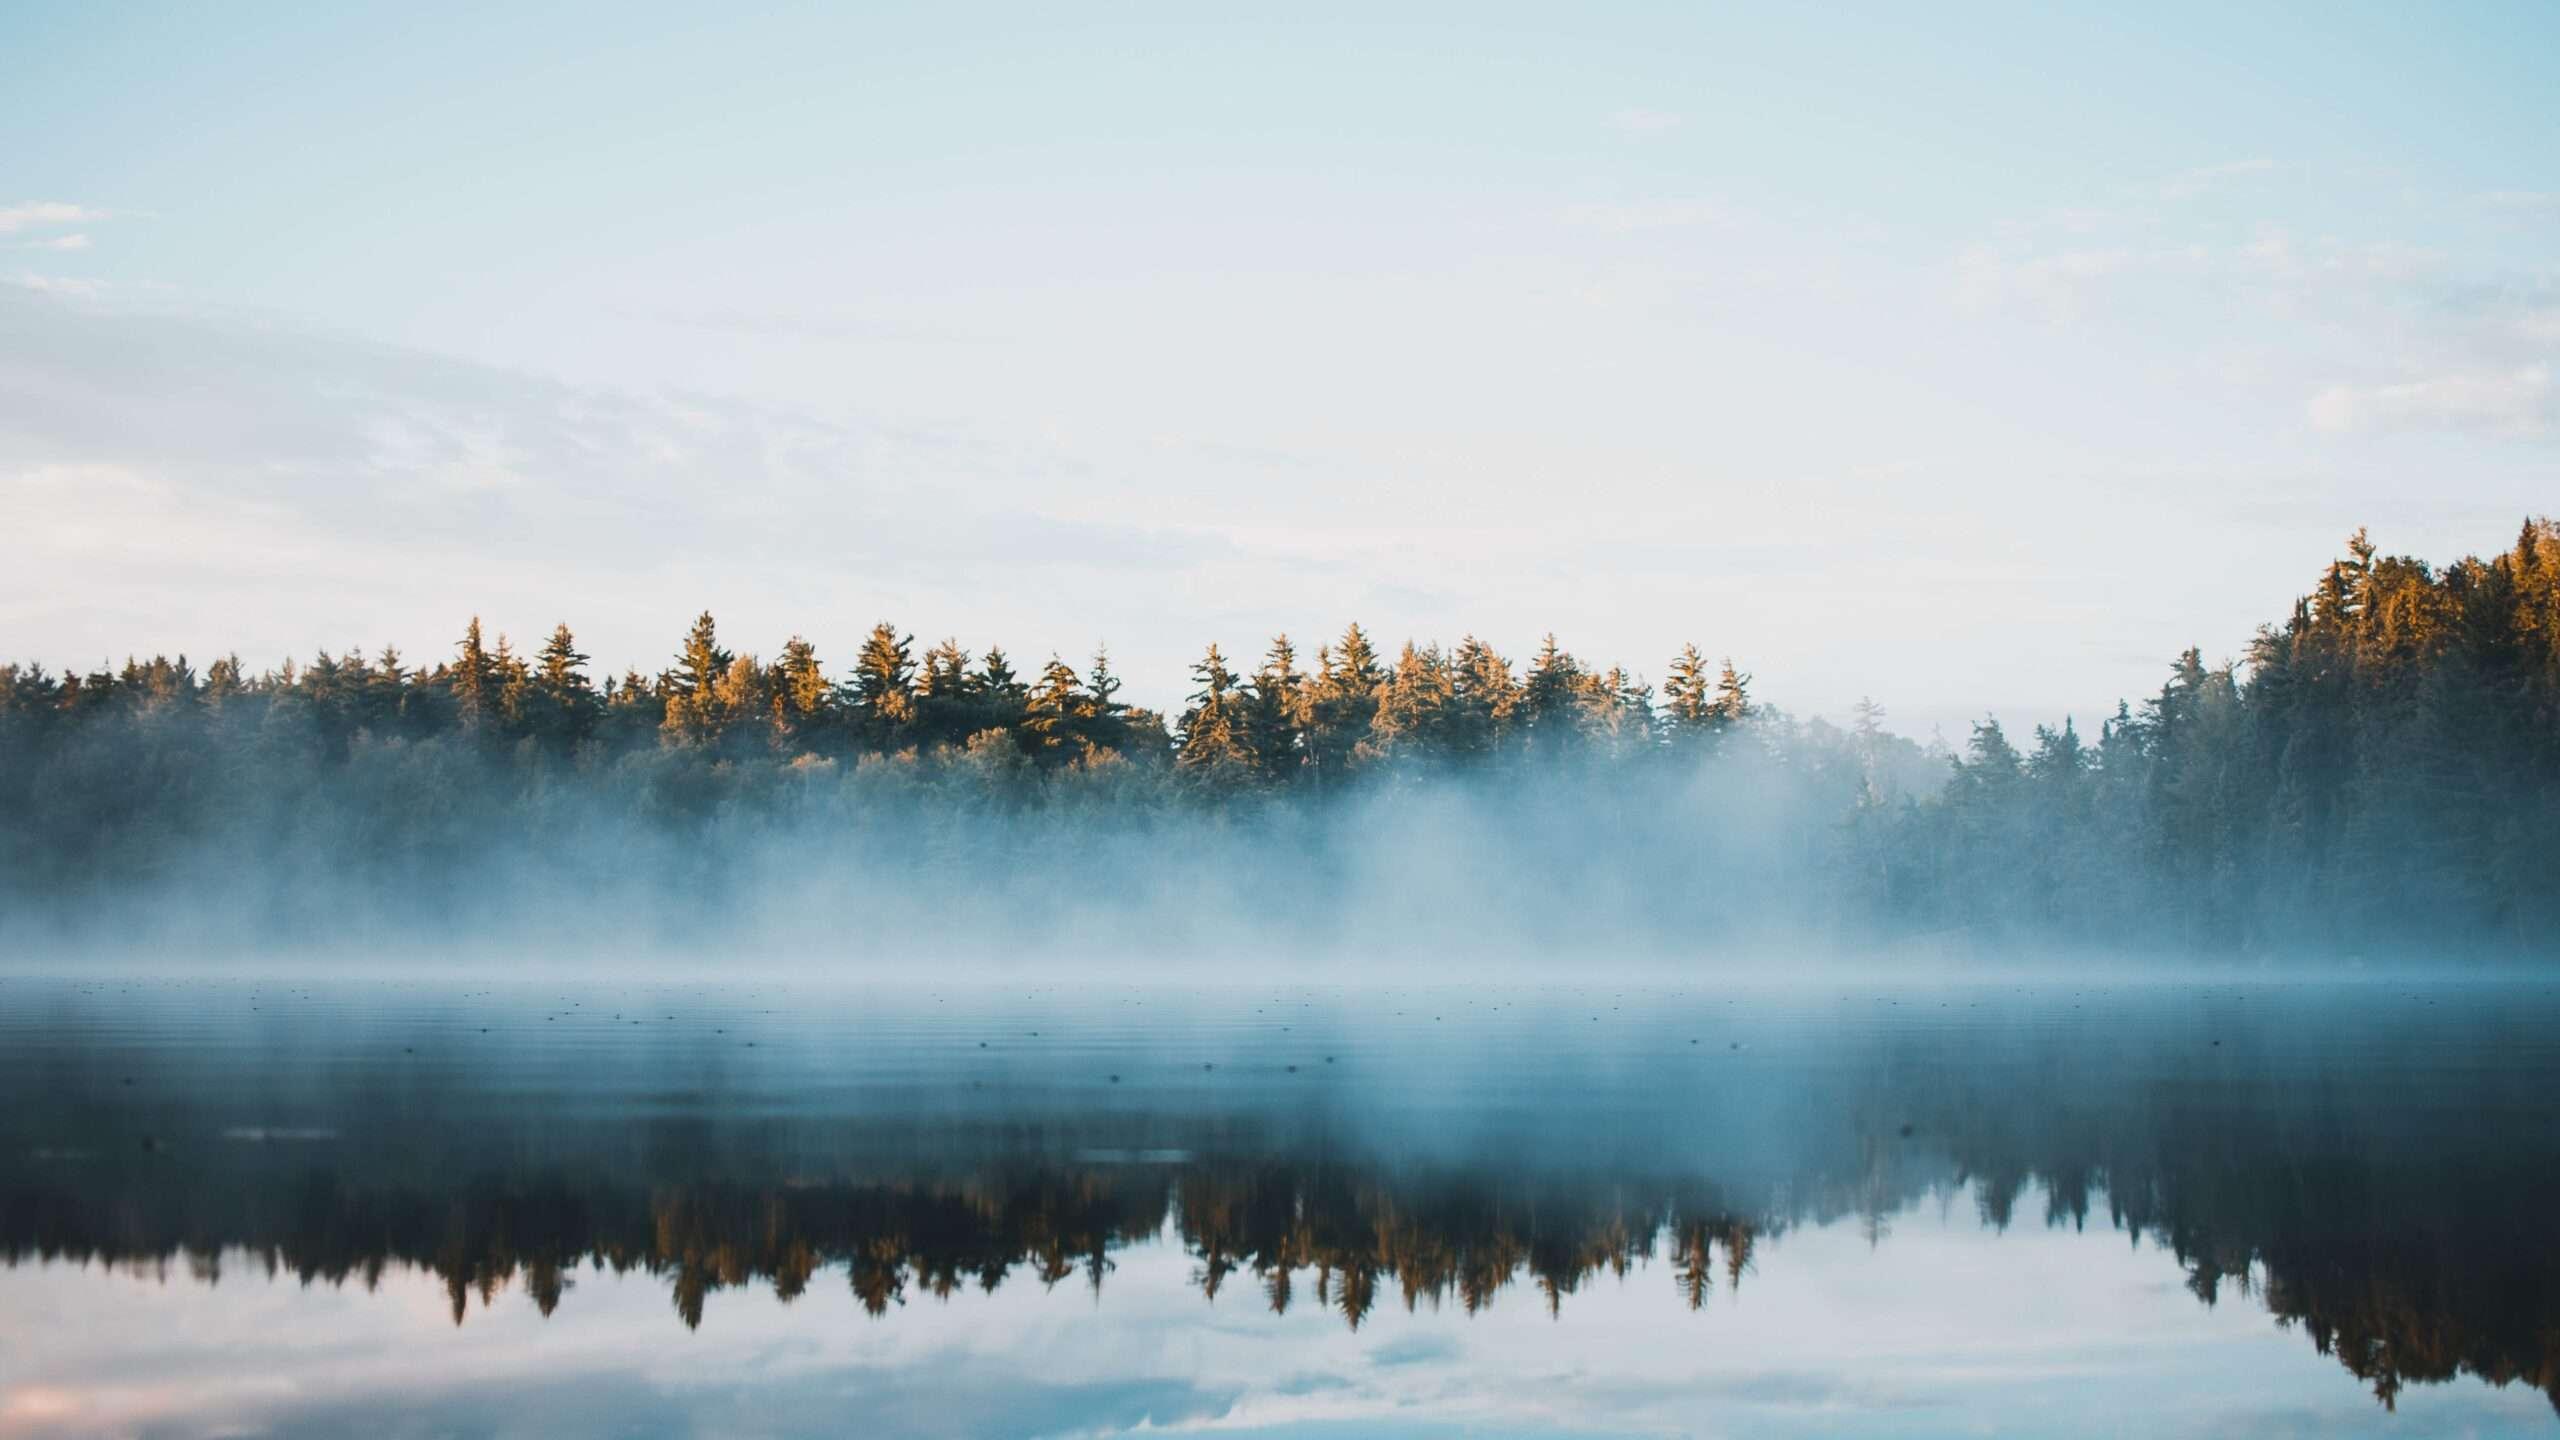 Misty lake in Ontario